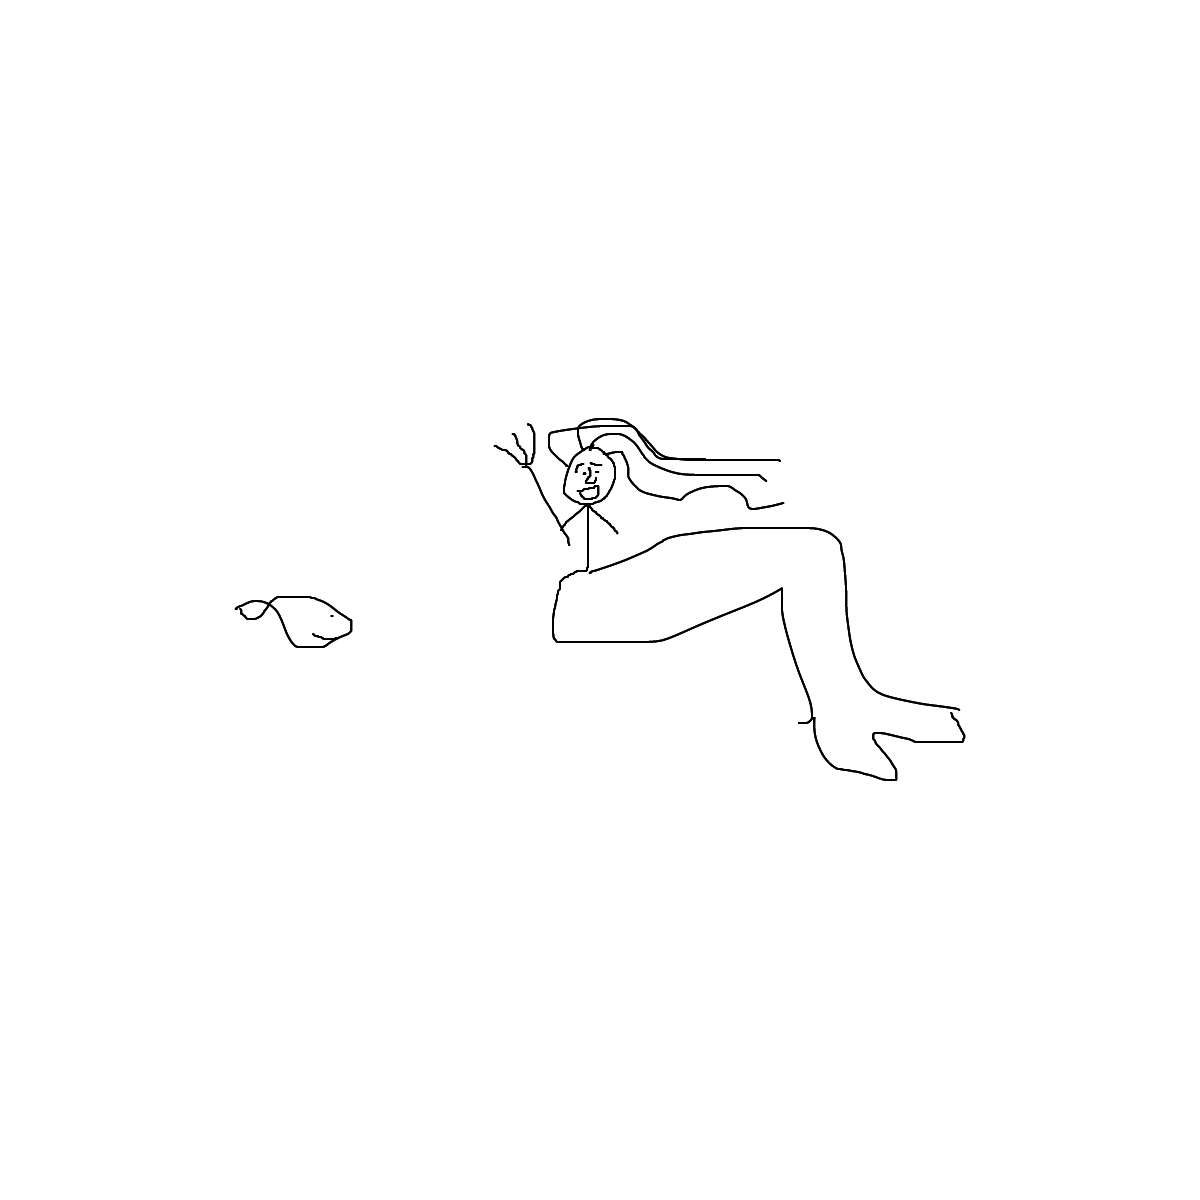 BAAAM drawing#15764 lat:-23.5479621887207030lng: -46.6515769958496100